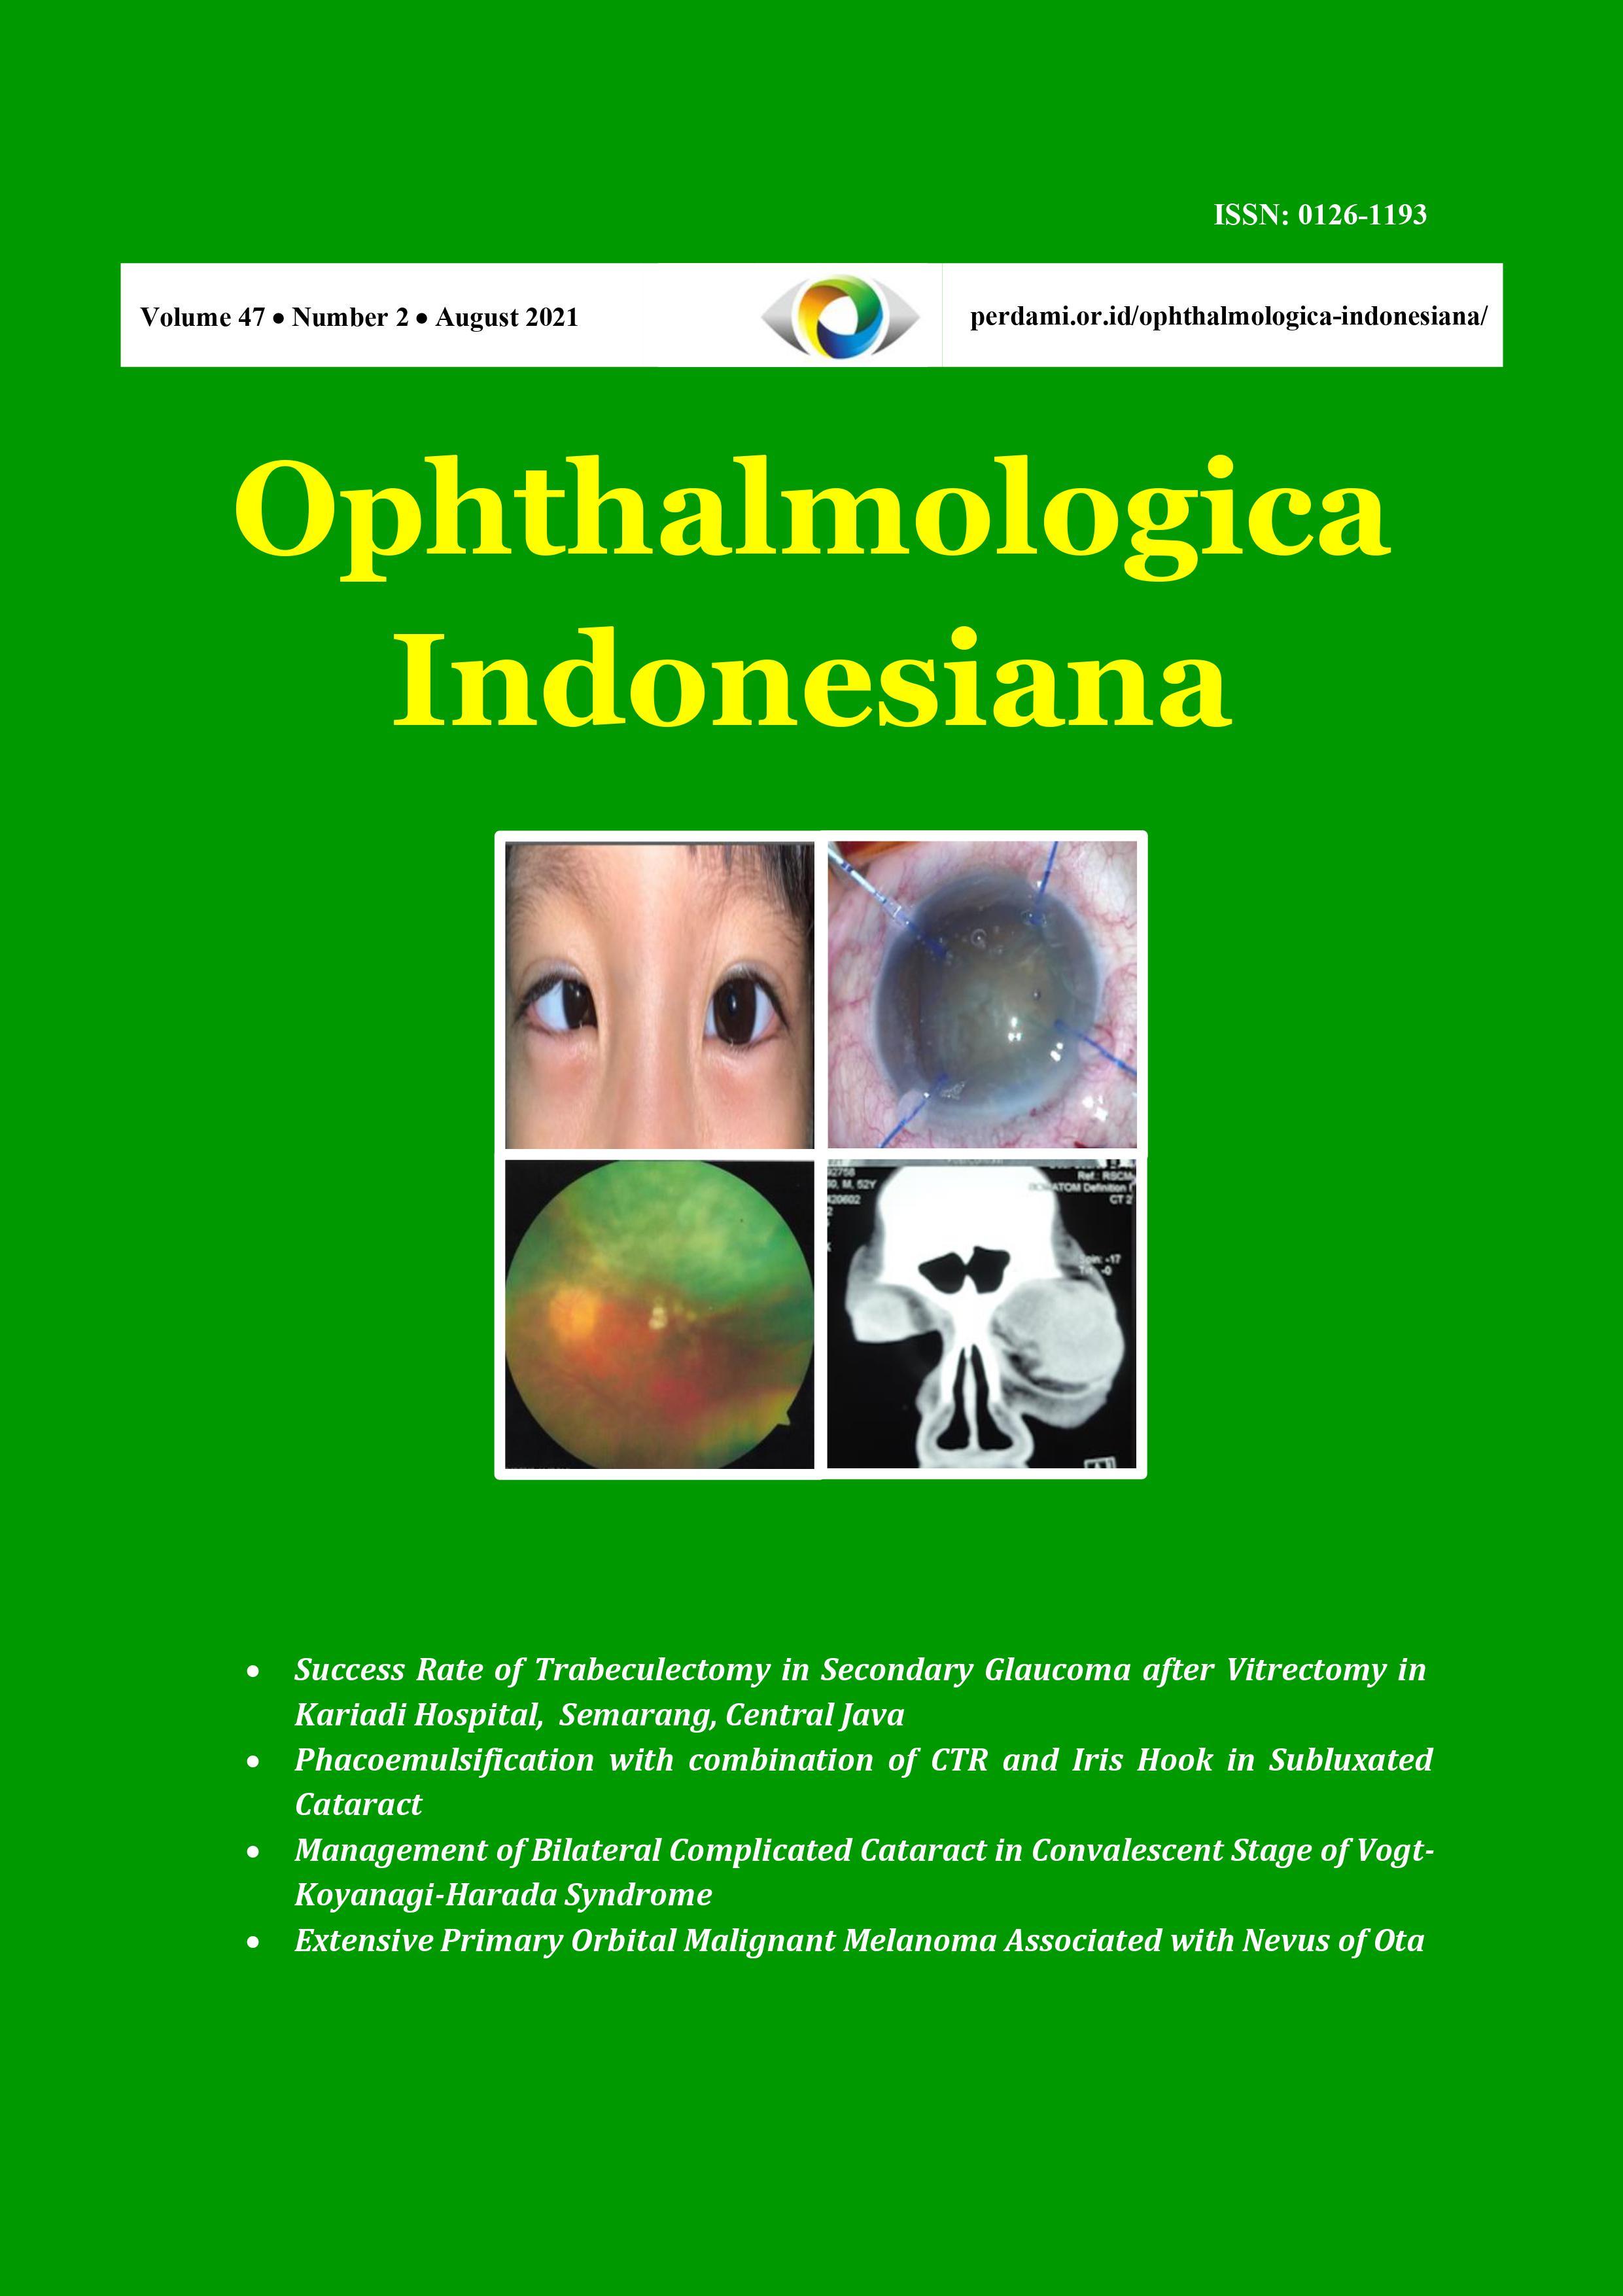 View Vol. 47 No. 2 (2021): Ophthalmologica Indonesiana